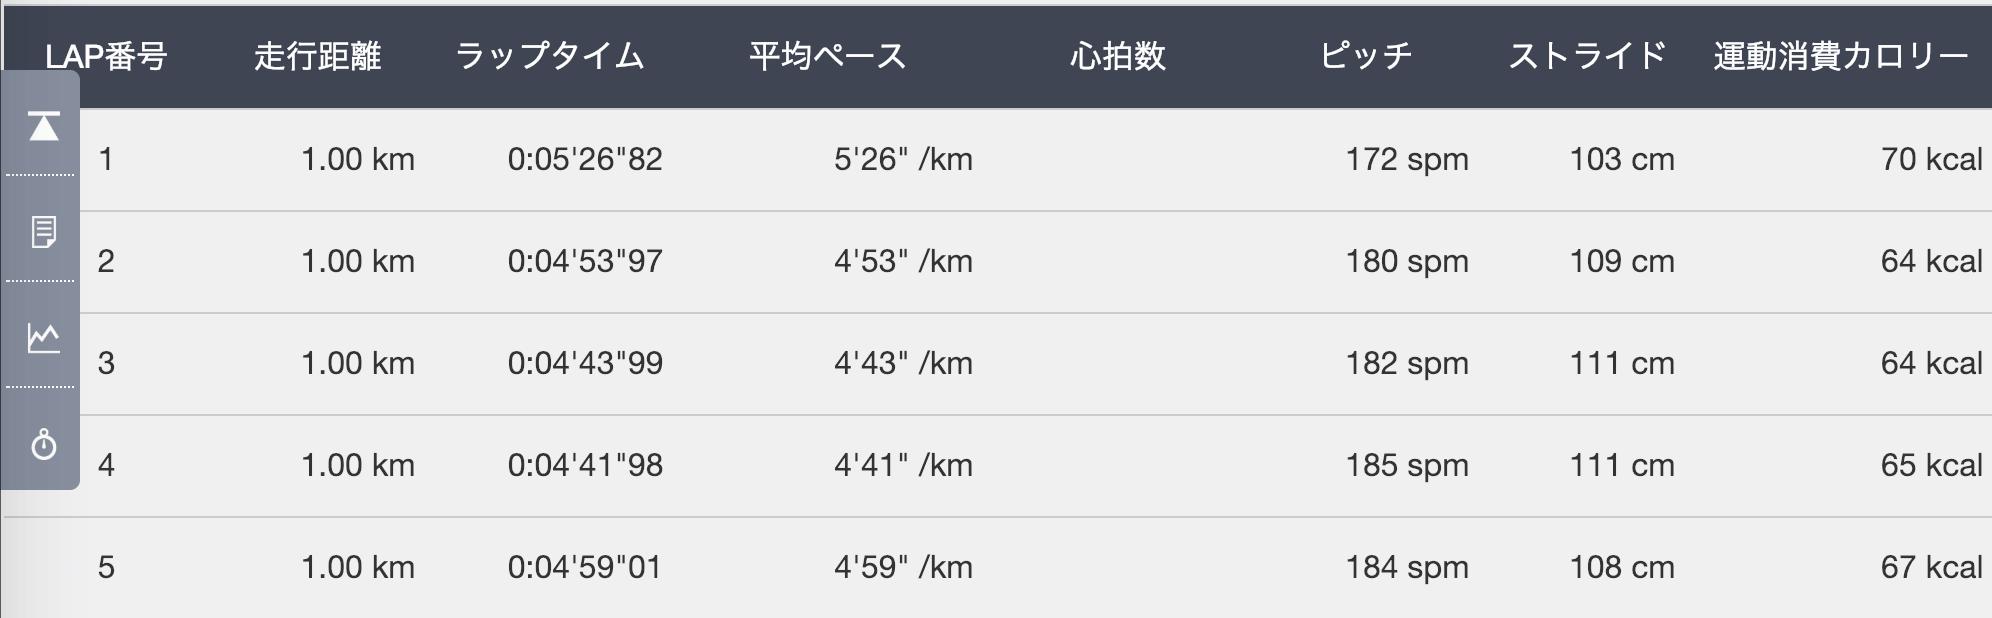 0〜5km